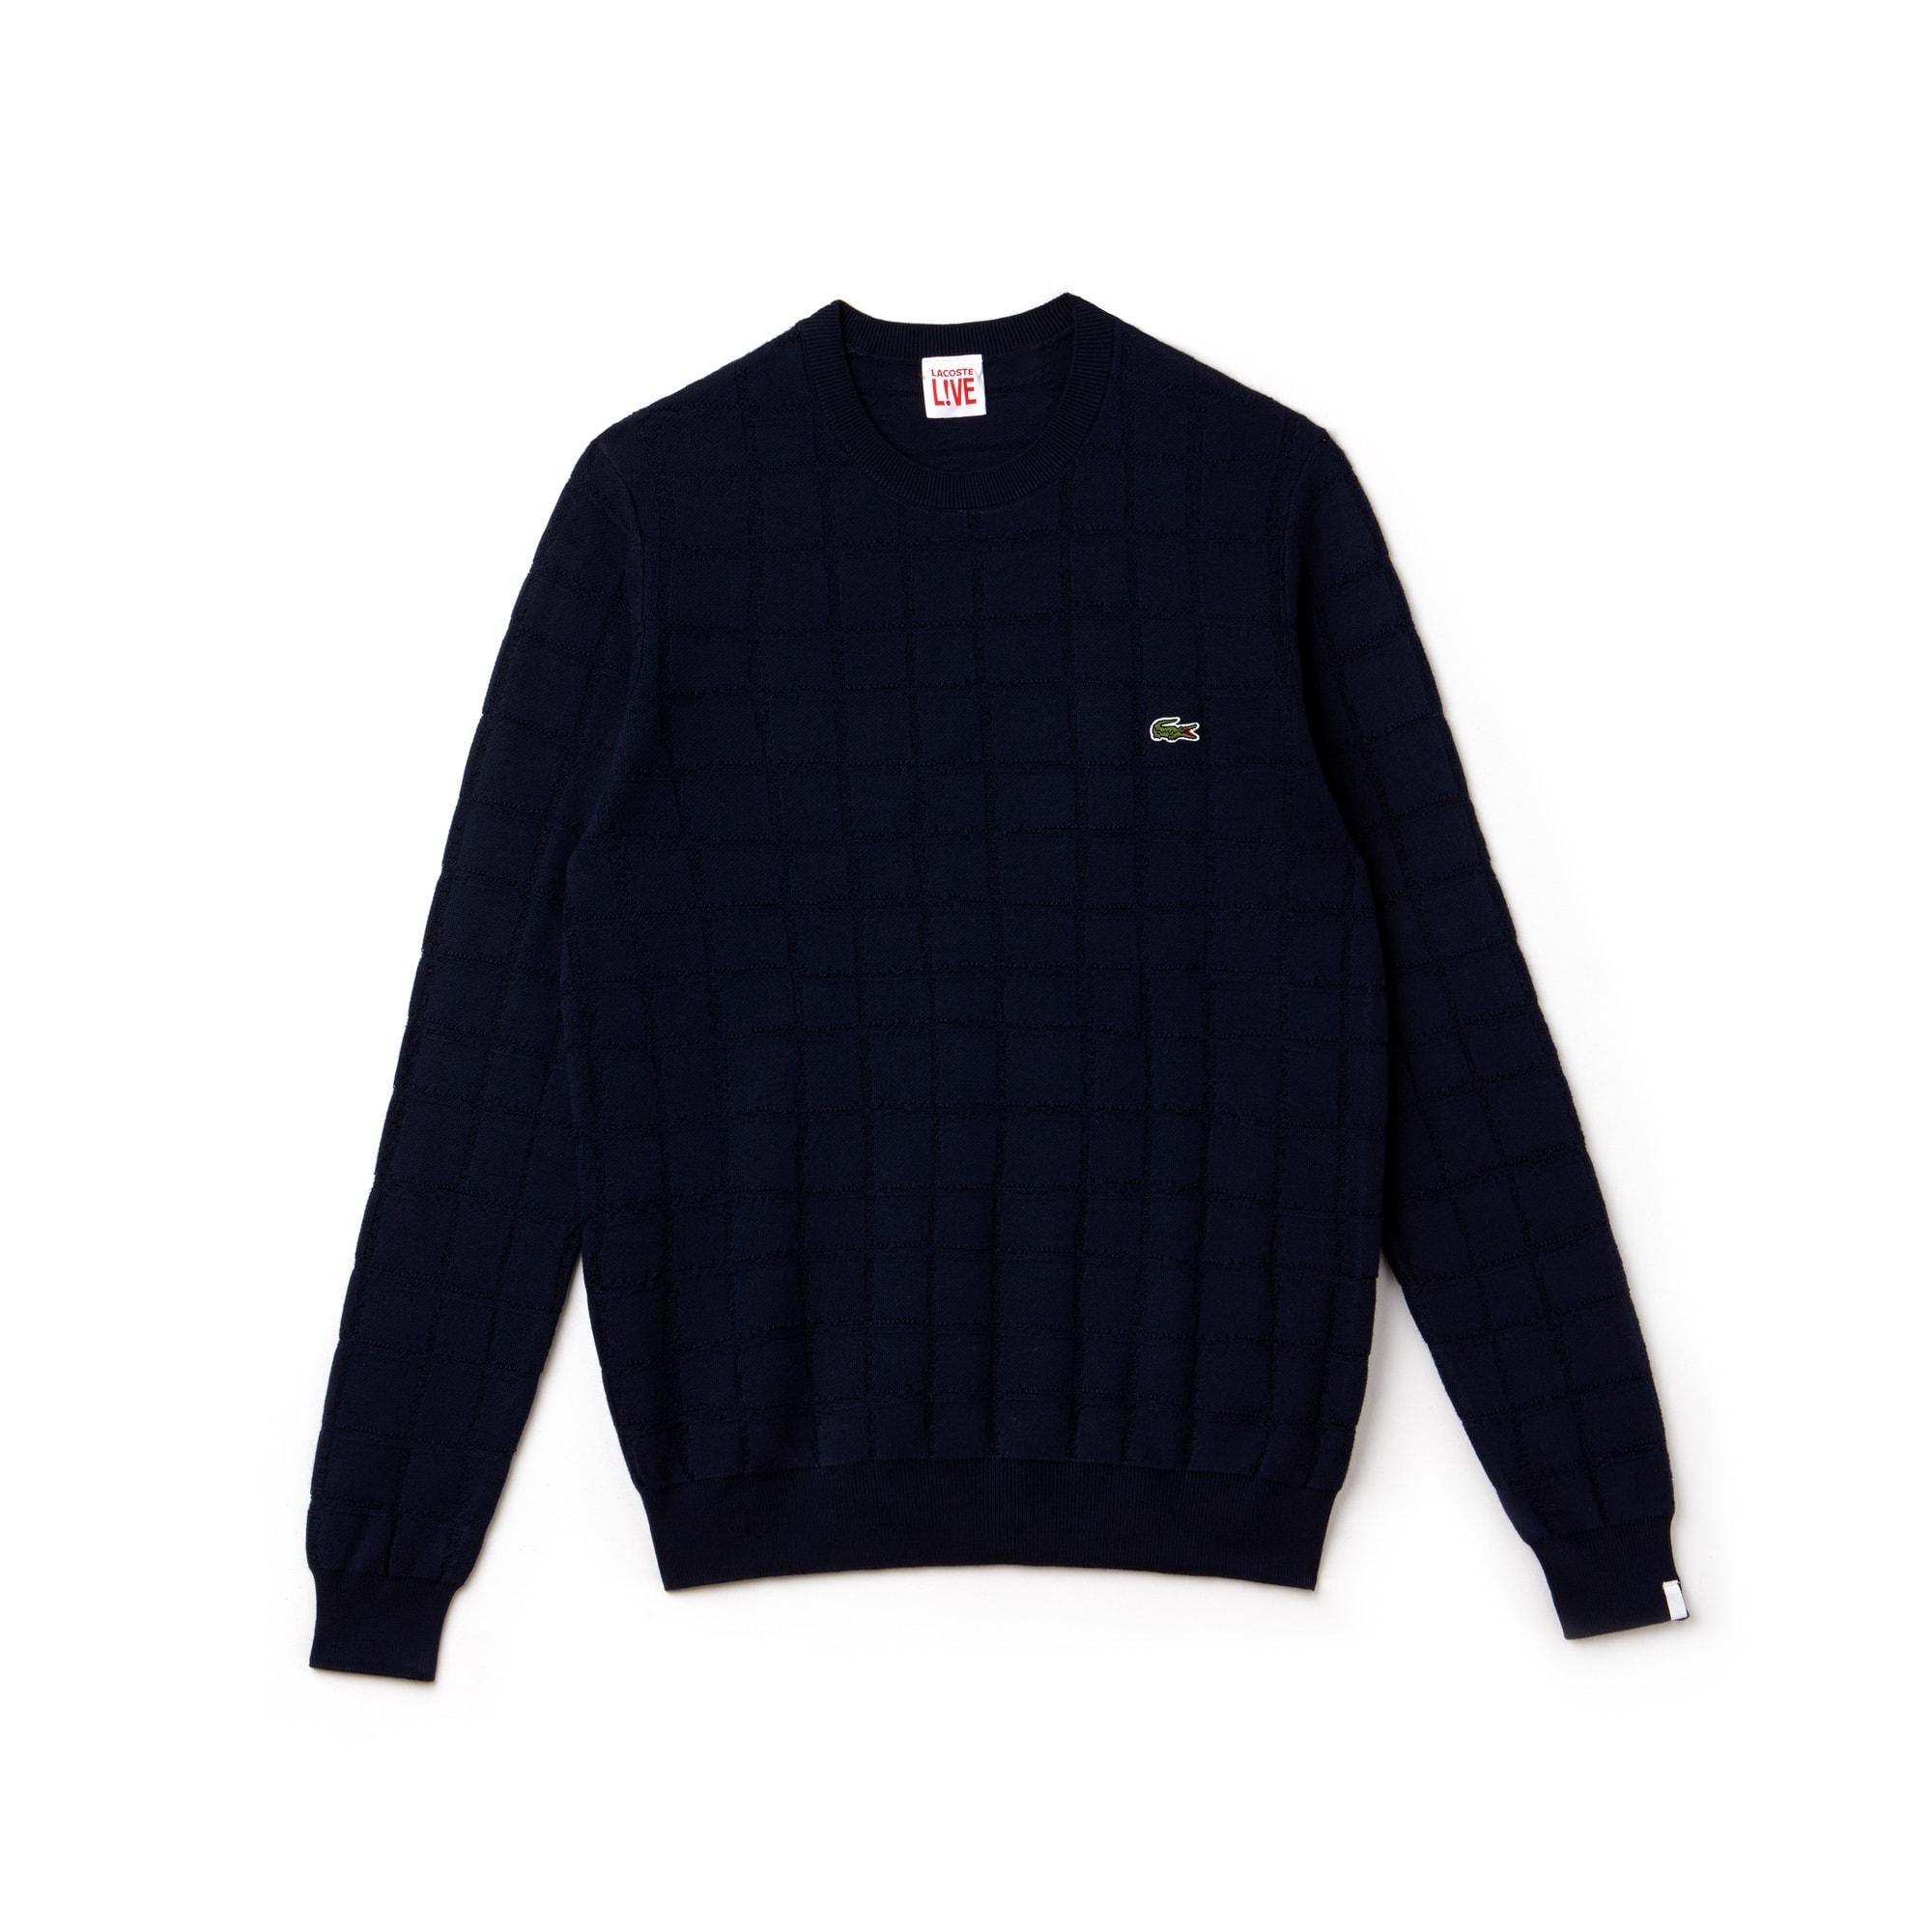 Pullovers Lacoste Homme SweatshirtsSoldes Pullovers Lacoste Et Et SweatshirtsSoldes Pullovers Homme rWxoeCdB